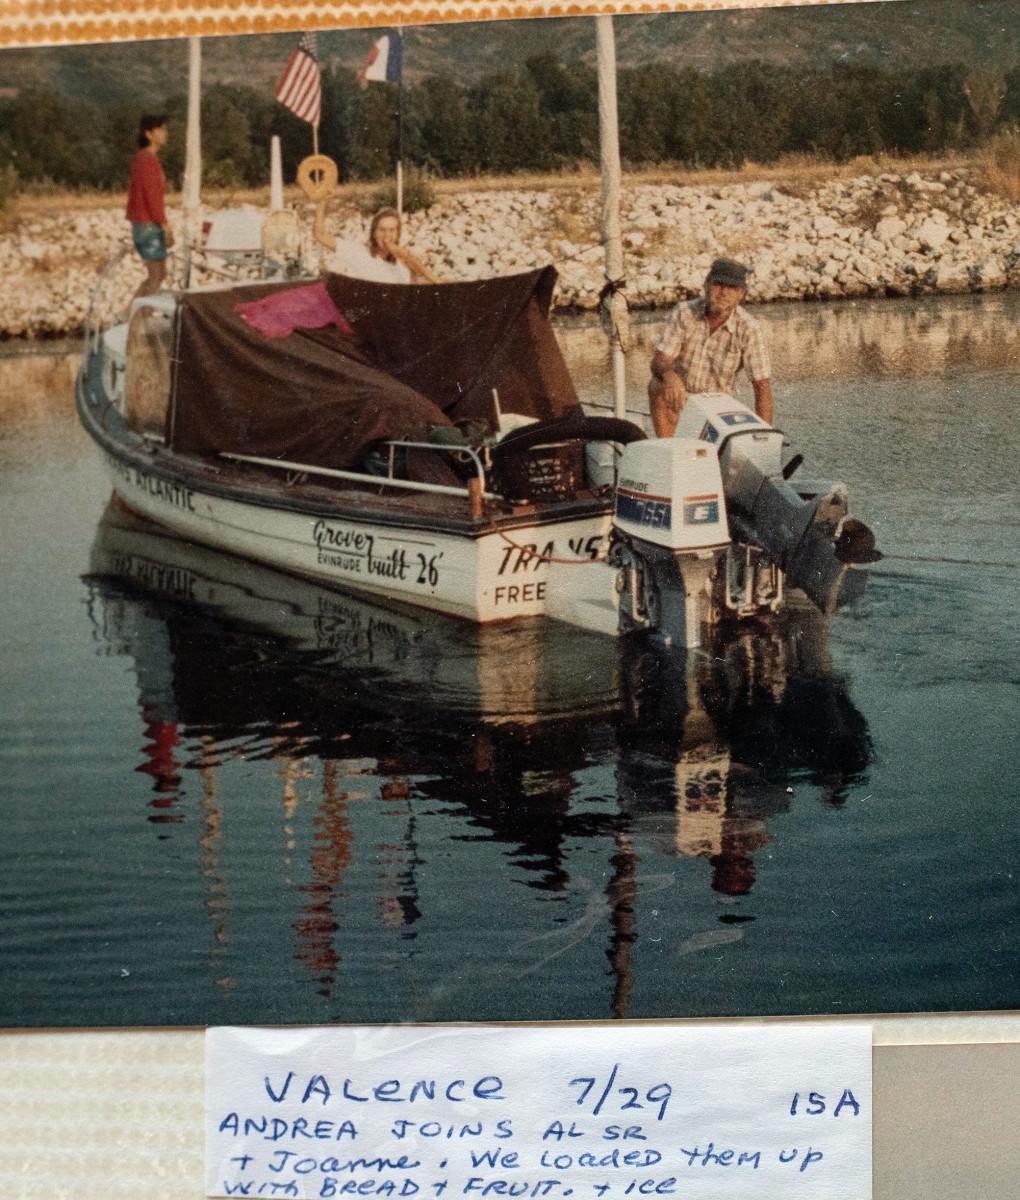 05-Al-Grover-Valence